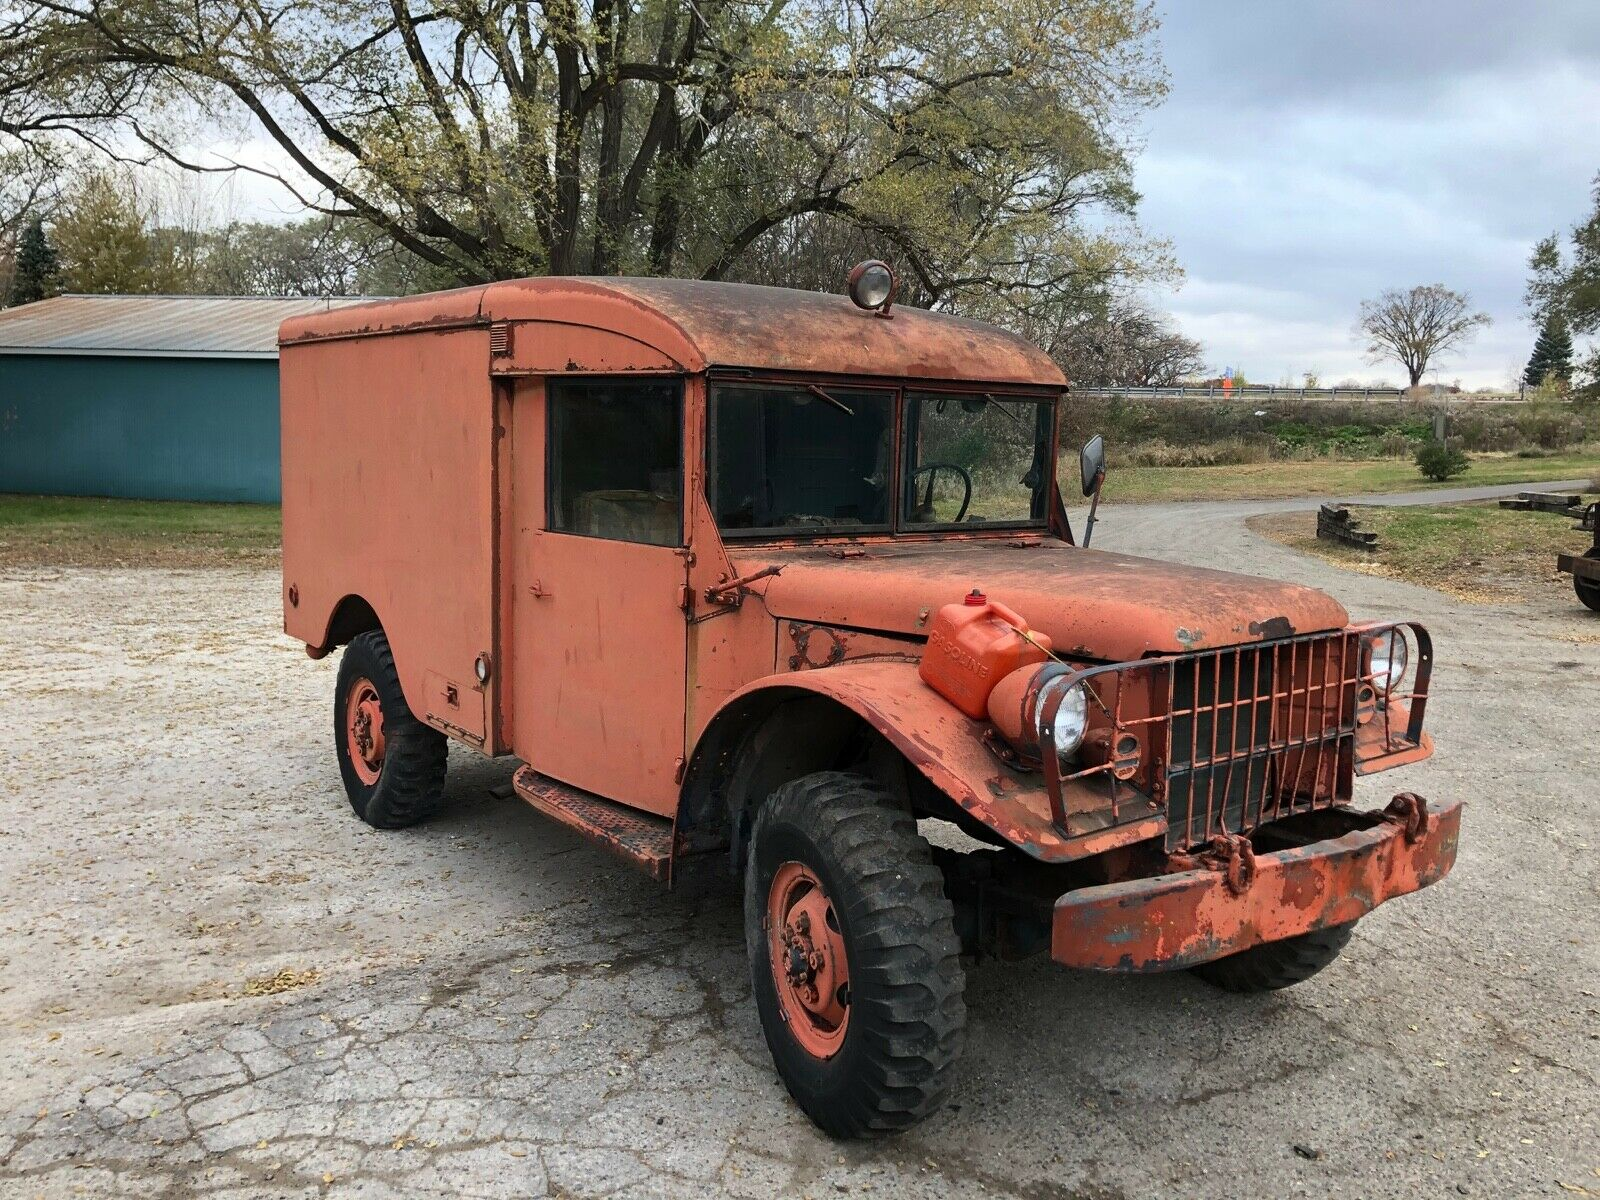 new parts 1942 Dodge M43 Ambulance 4×4 Powerwagon military for sale